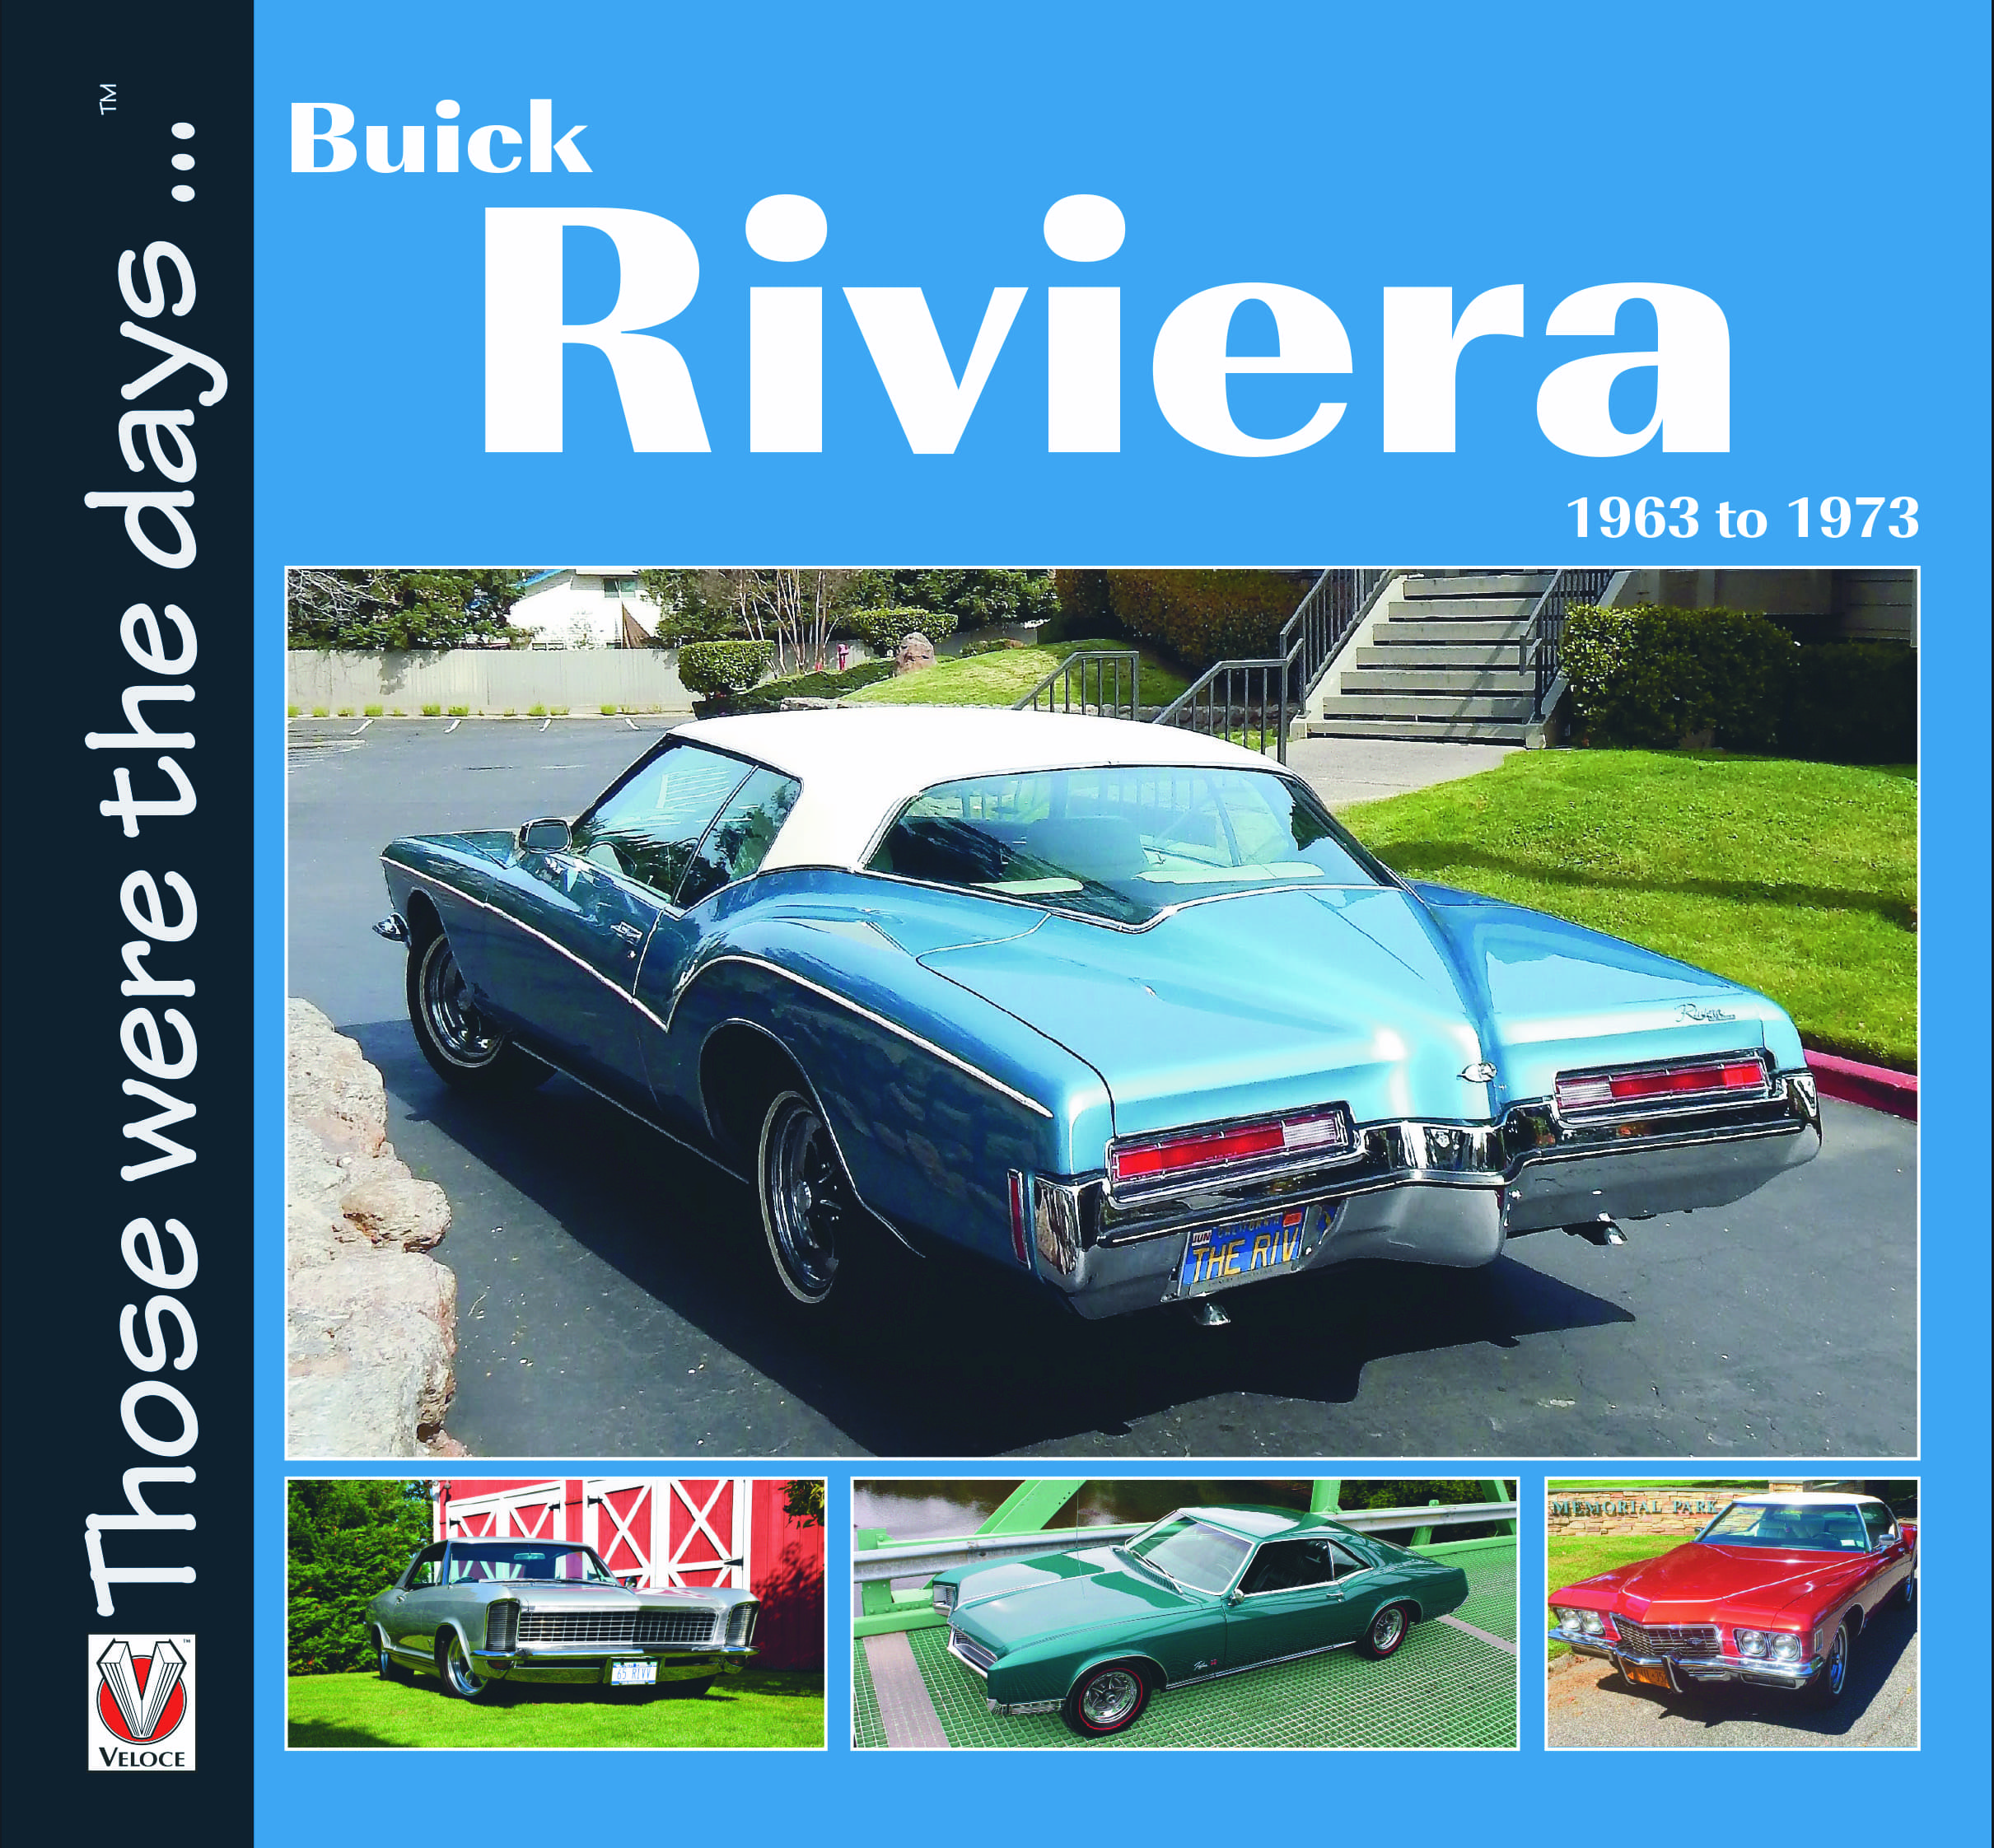 Buick Riviera cover